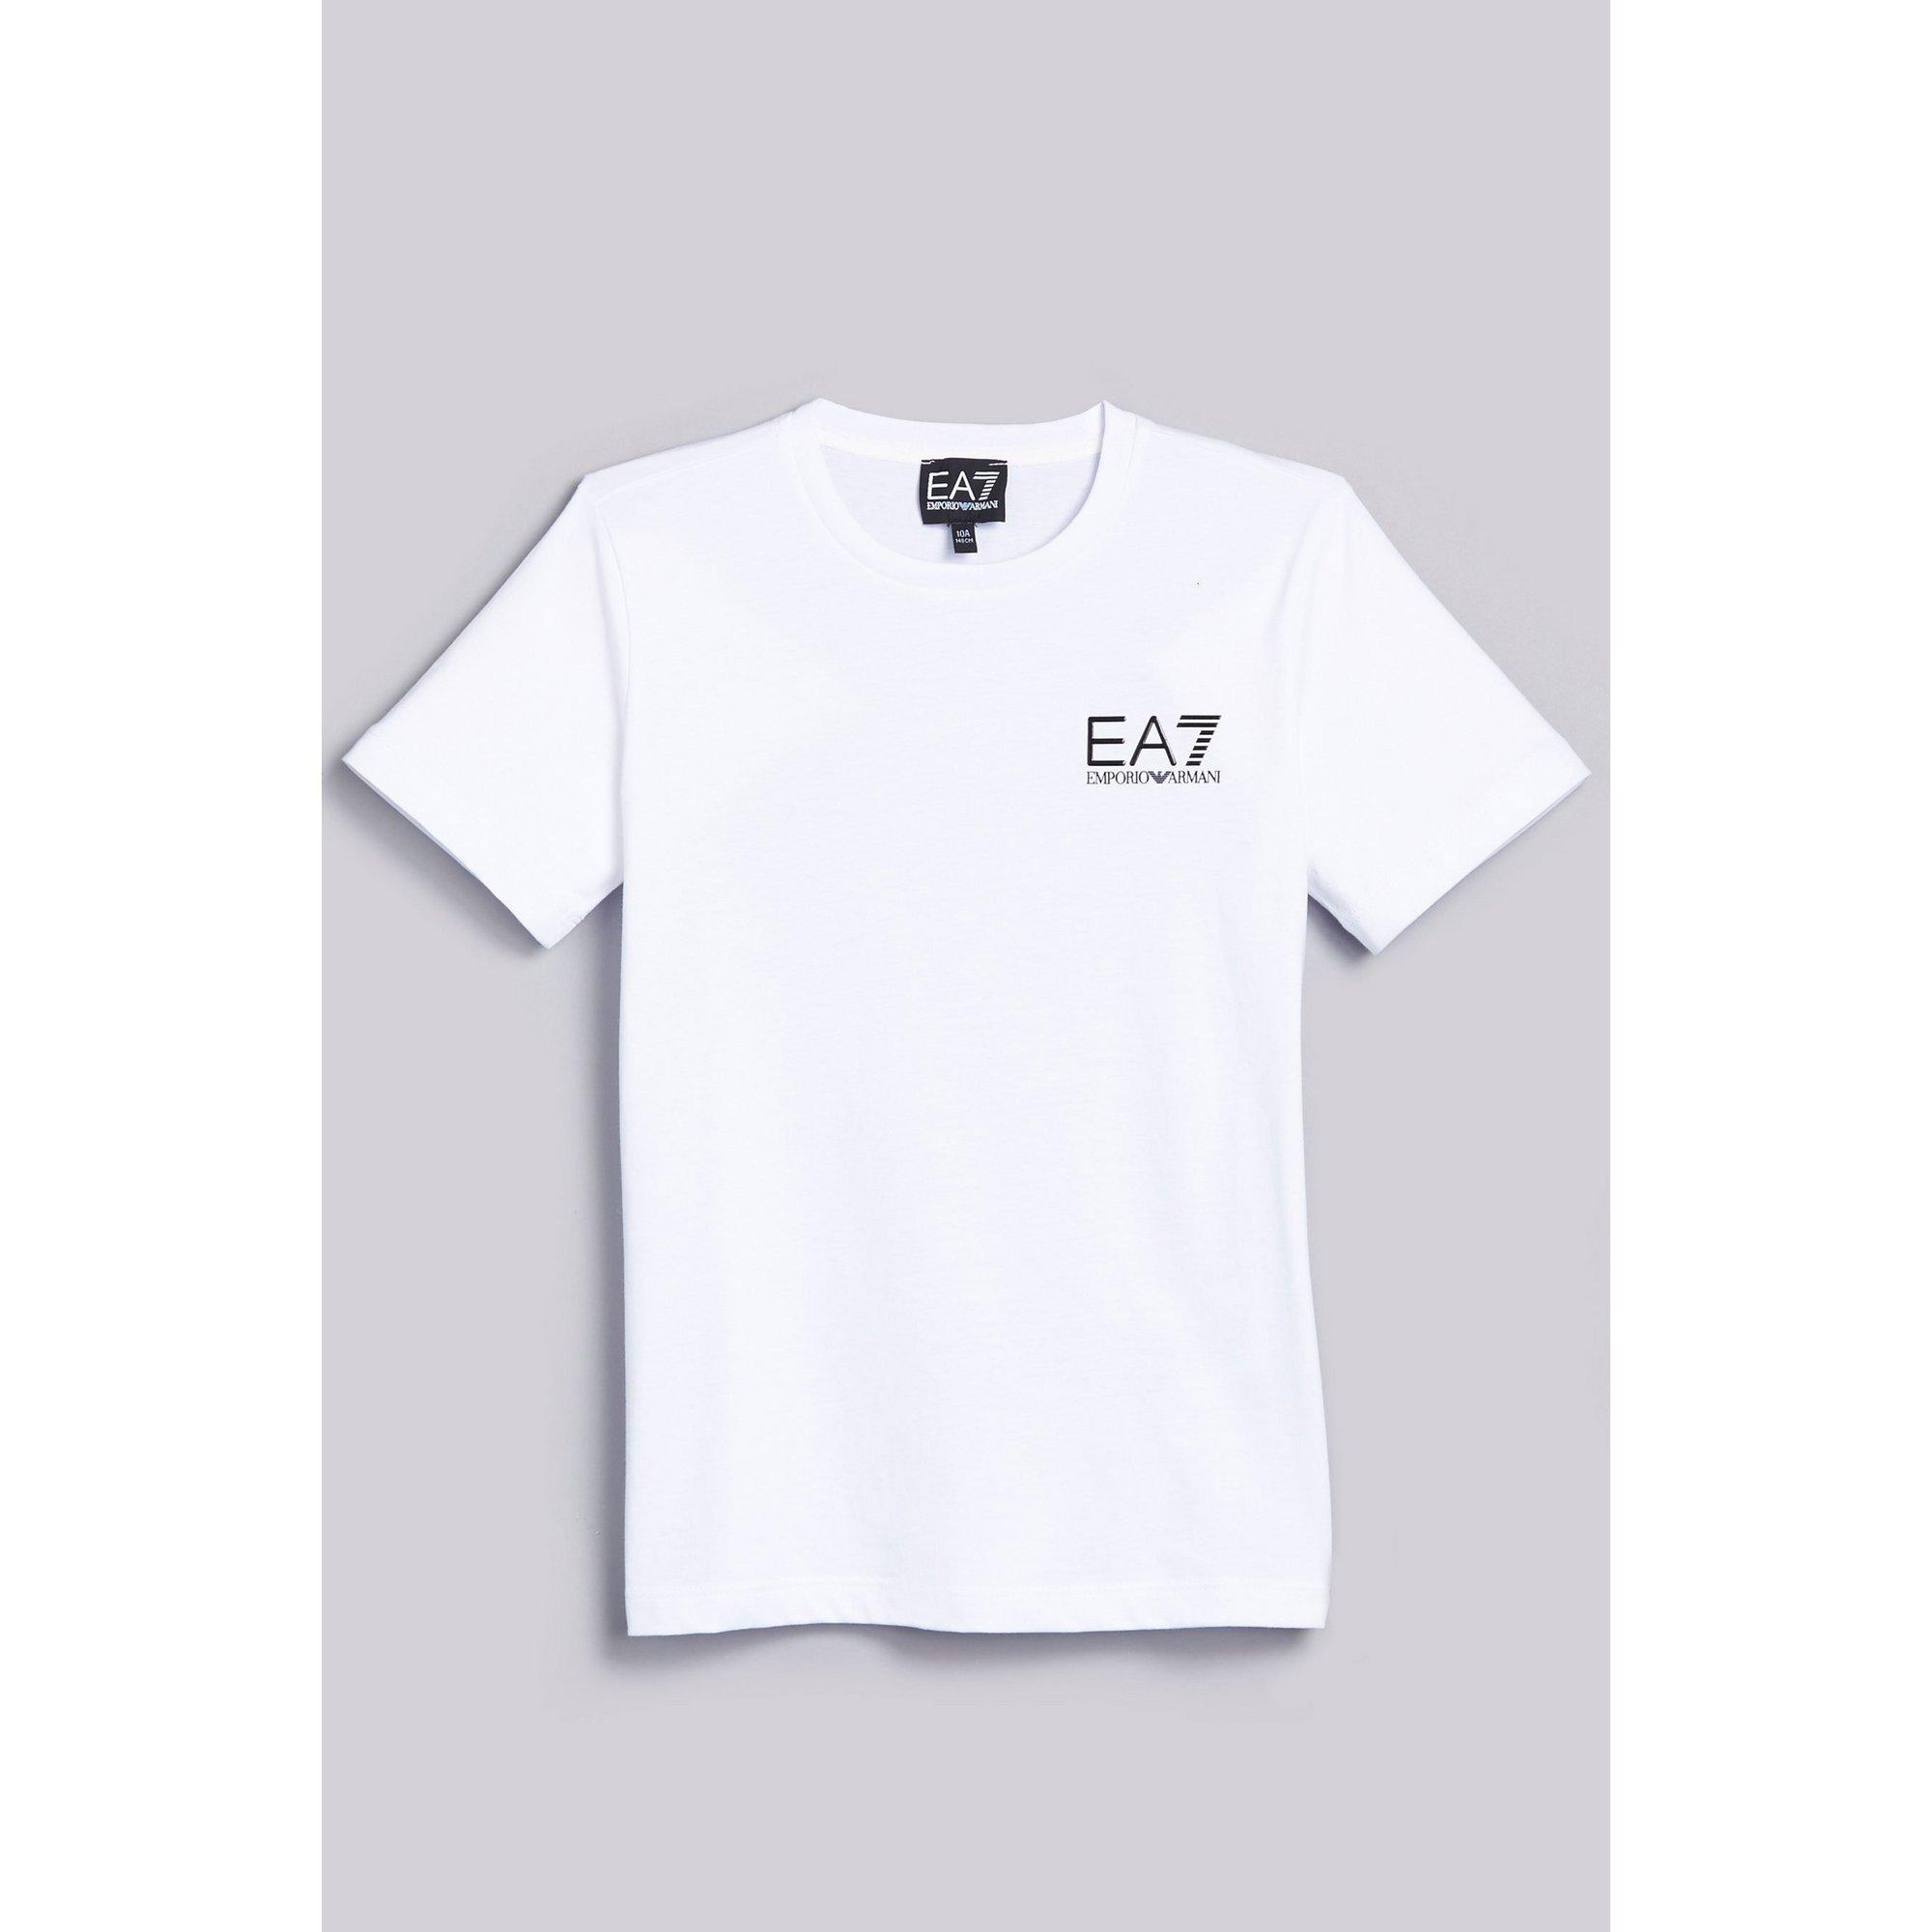 Image of Boys EA7 Train Core ID White T-Shirt